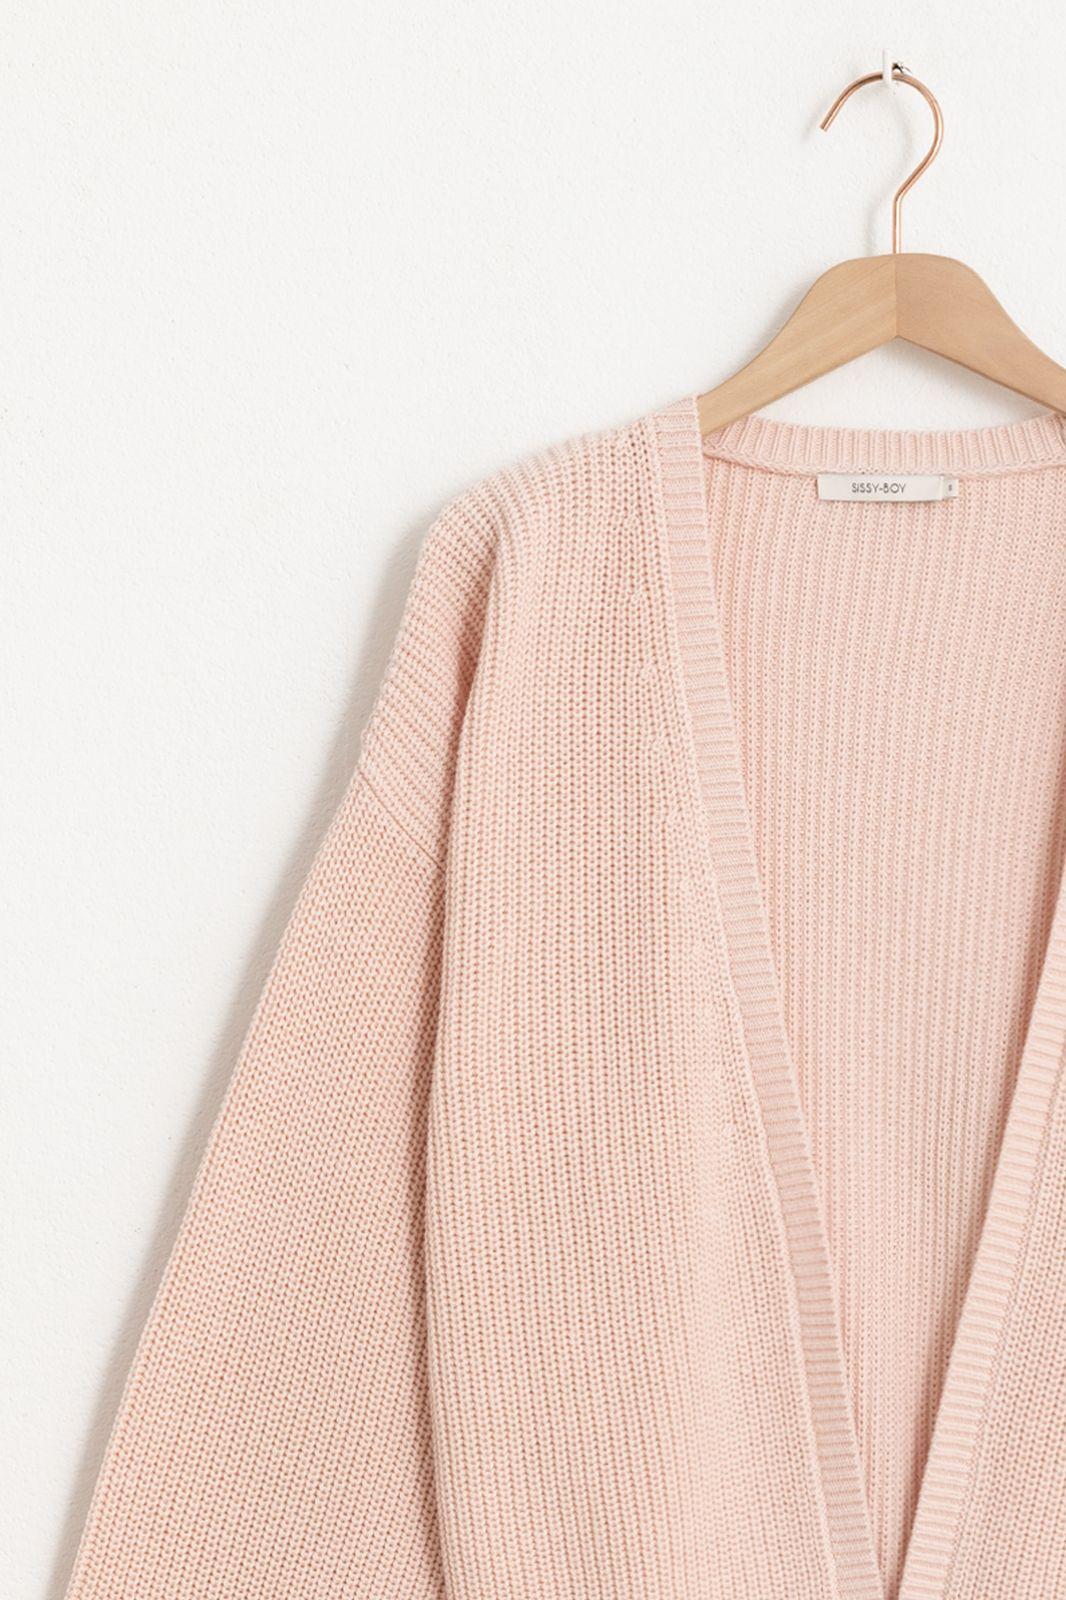 Gilet tricoté - rose clair